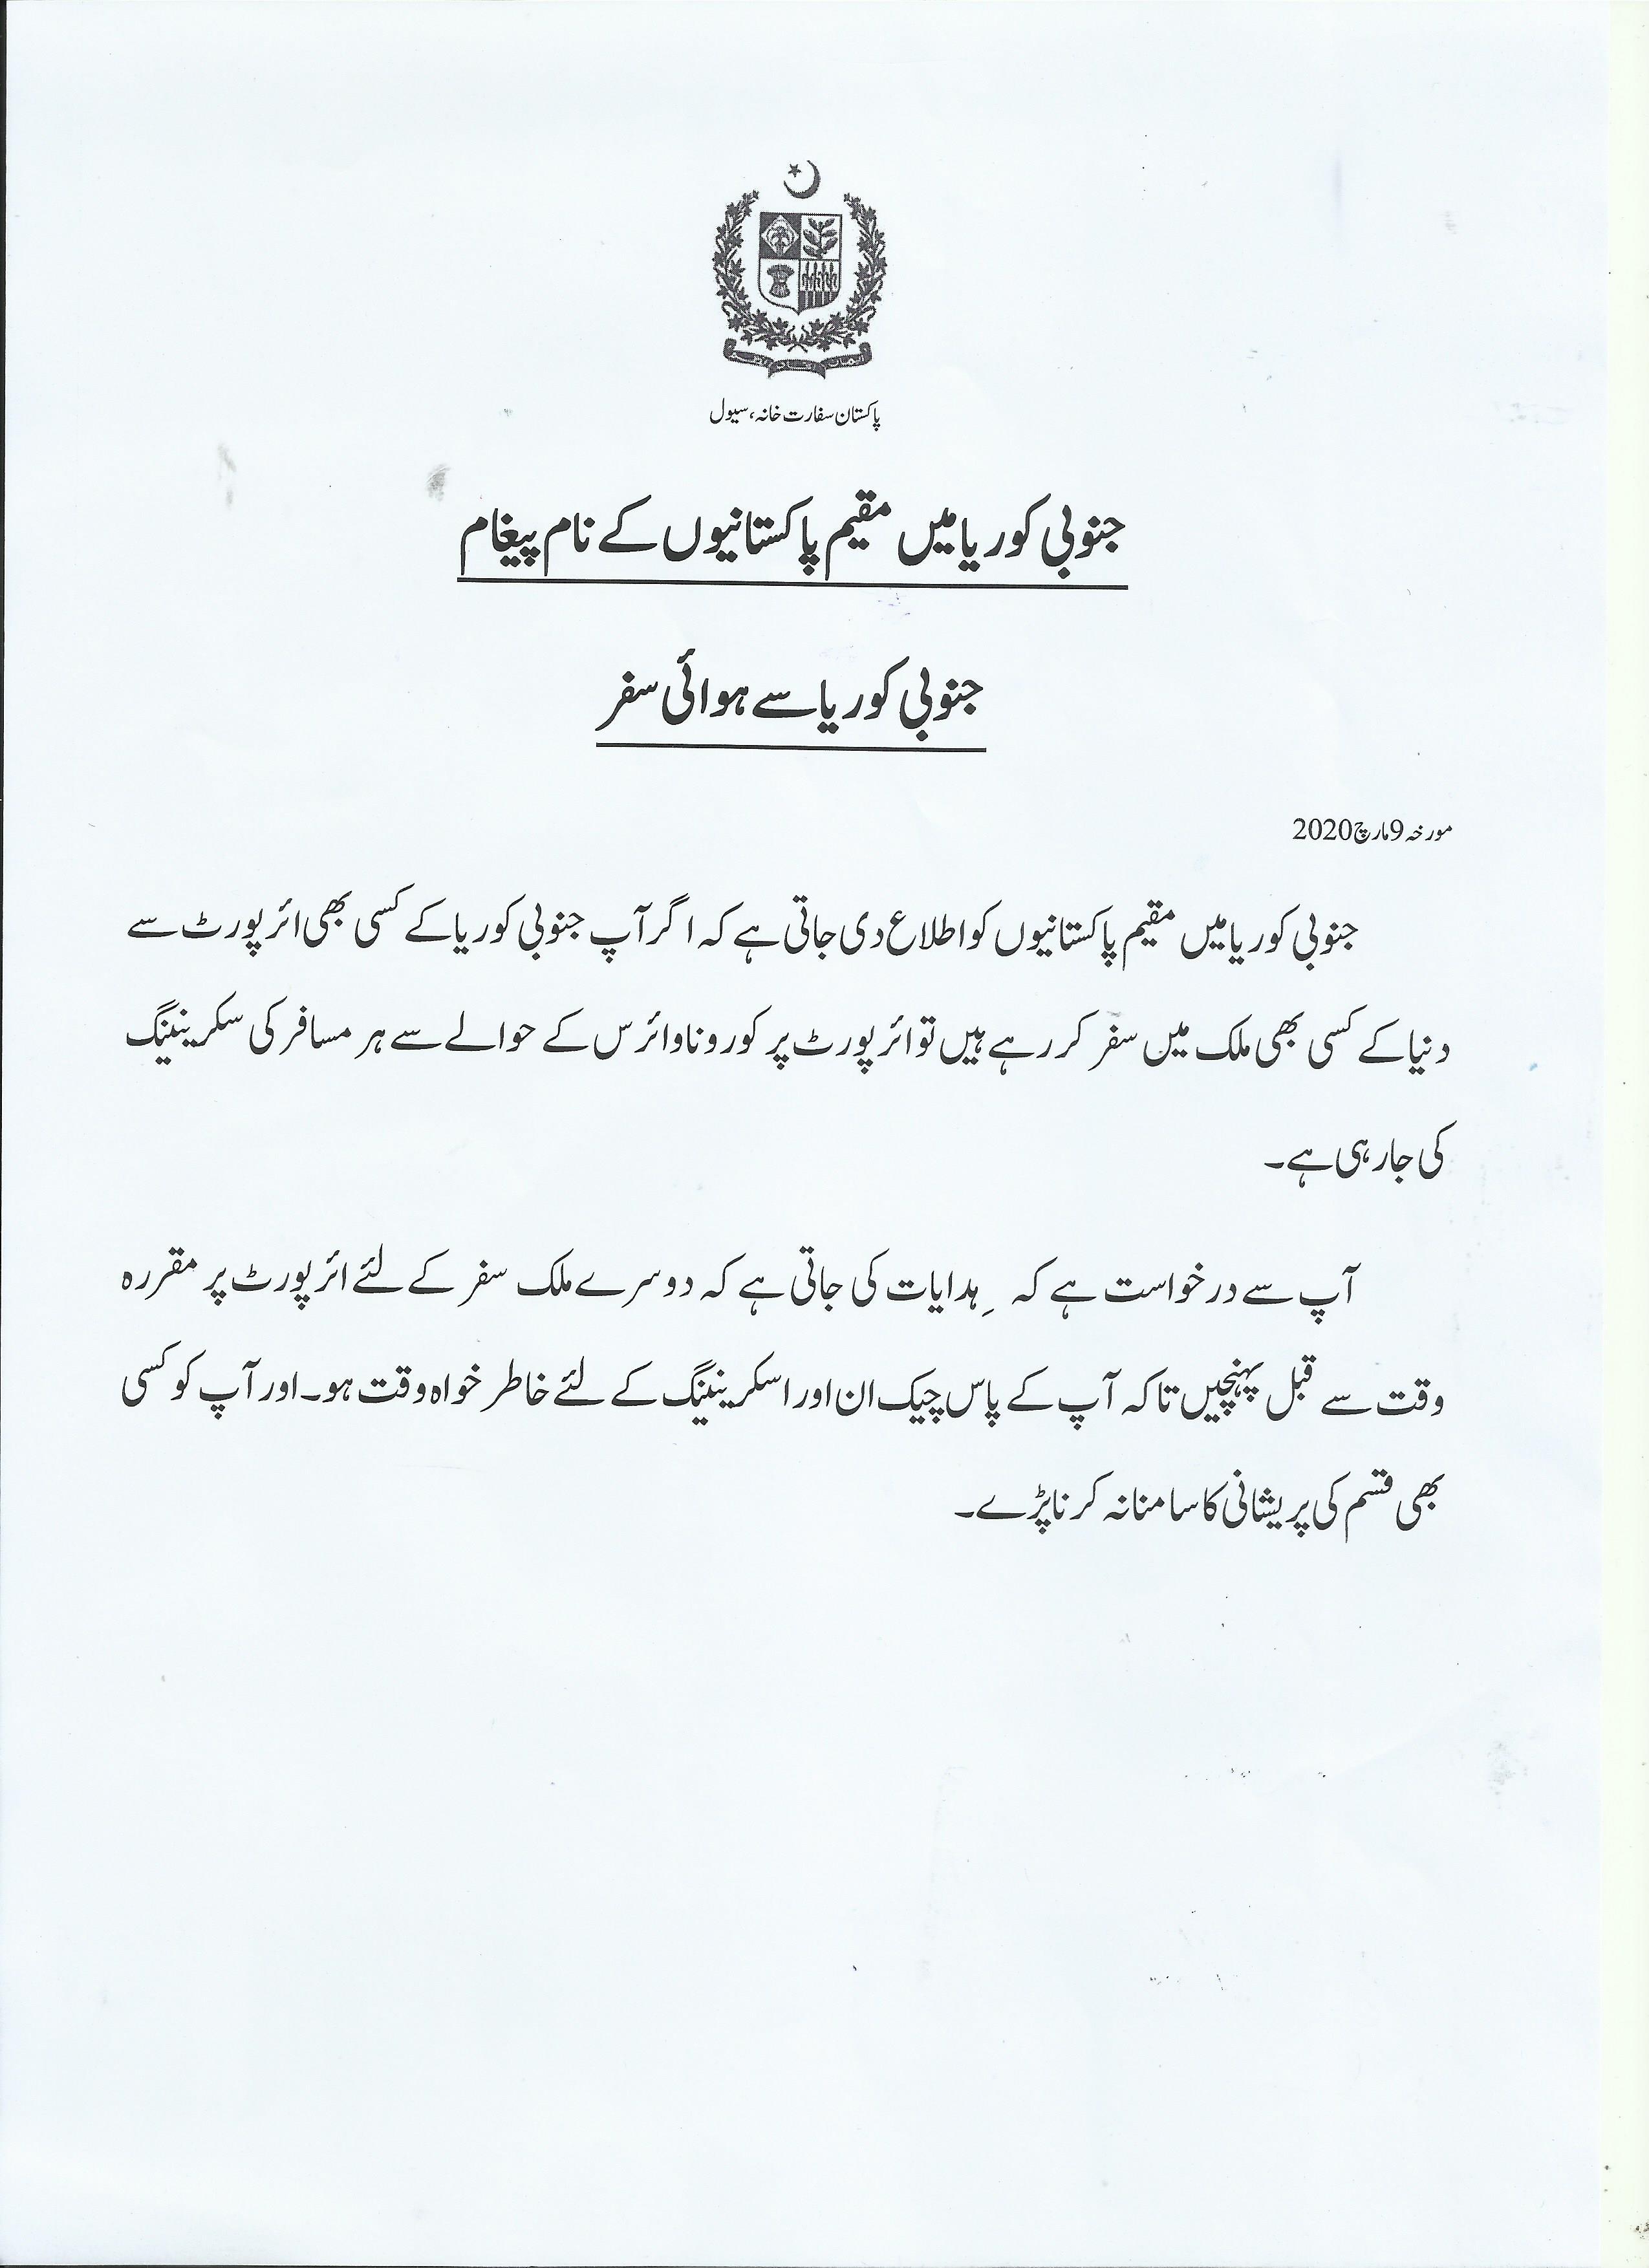 Notice 1 by Munawar